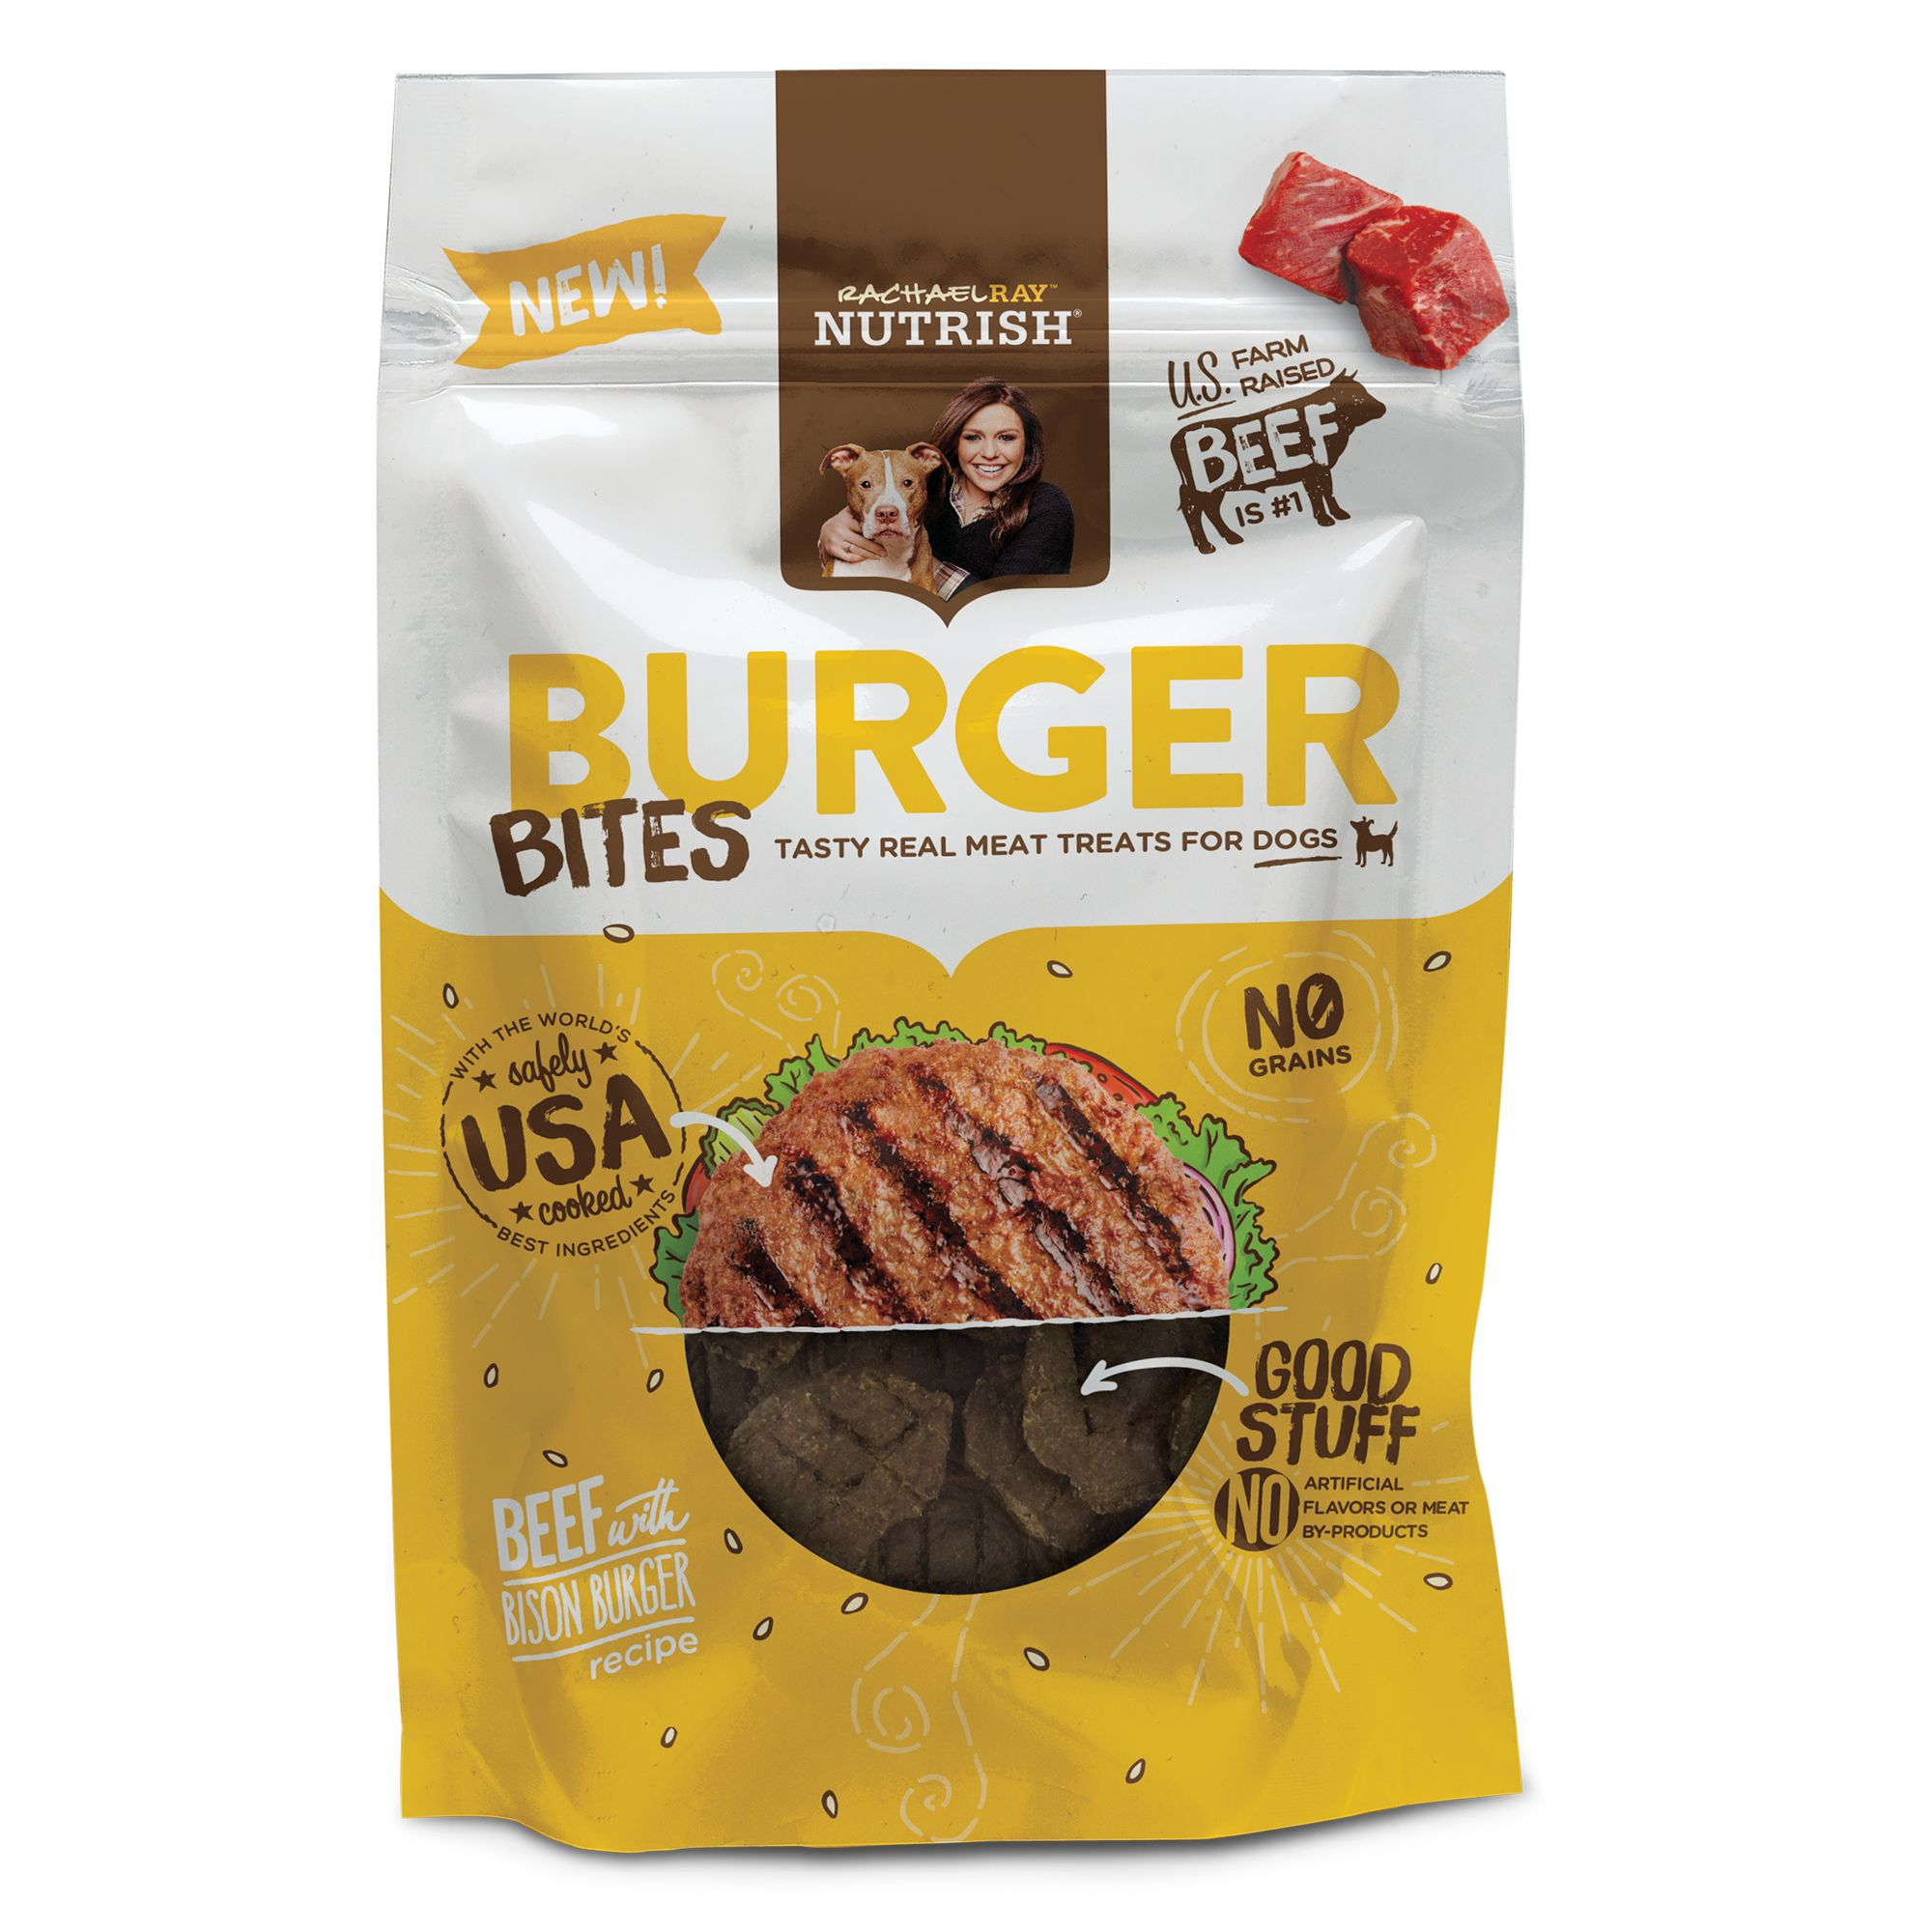 Rachael Ray, Nutrish Burger Bites Dog Treat - Grain Free, Beef with Bison Burger Recipe size: 3 Oz, Rachael Ray Nutrish 5278095